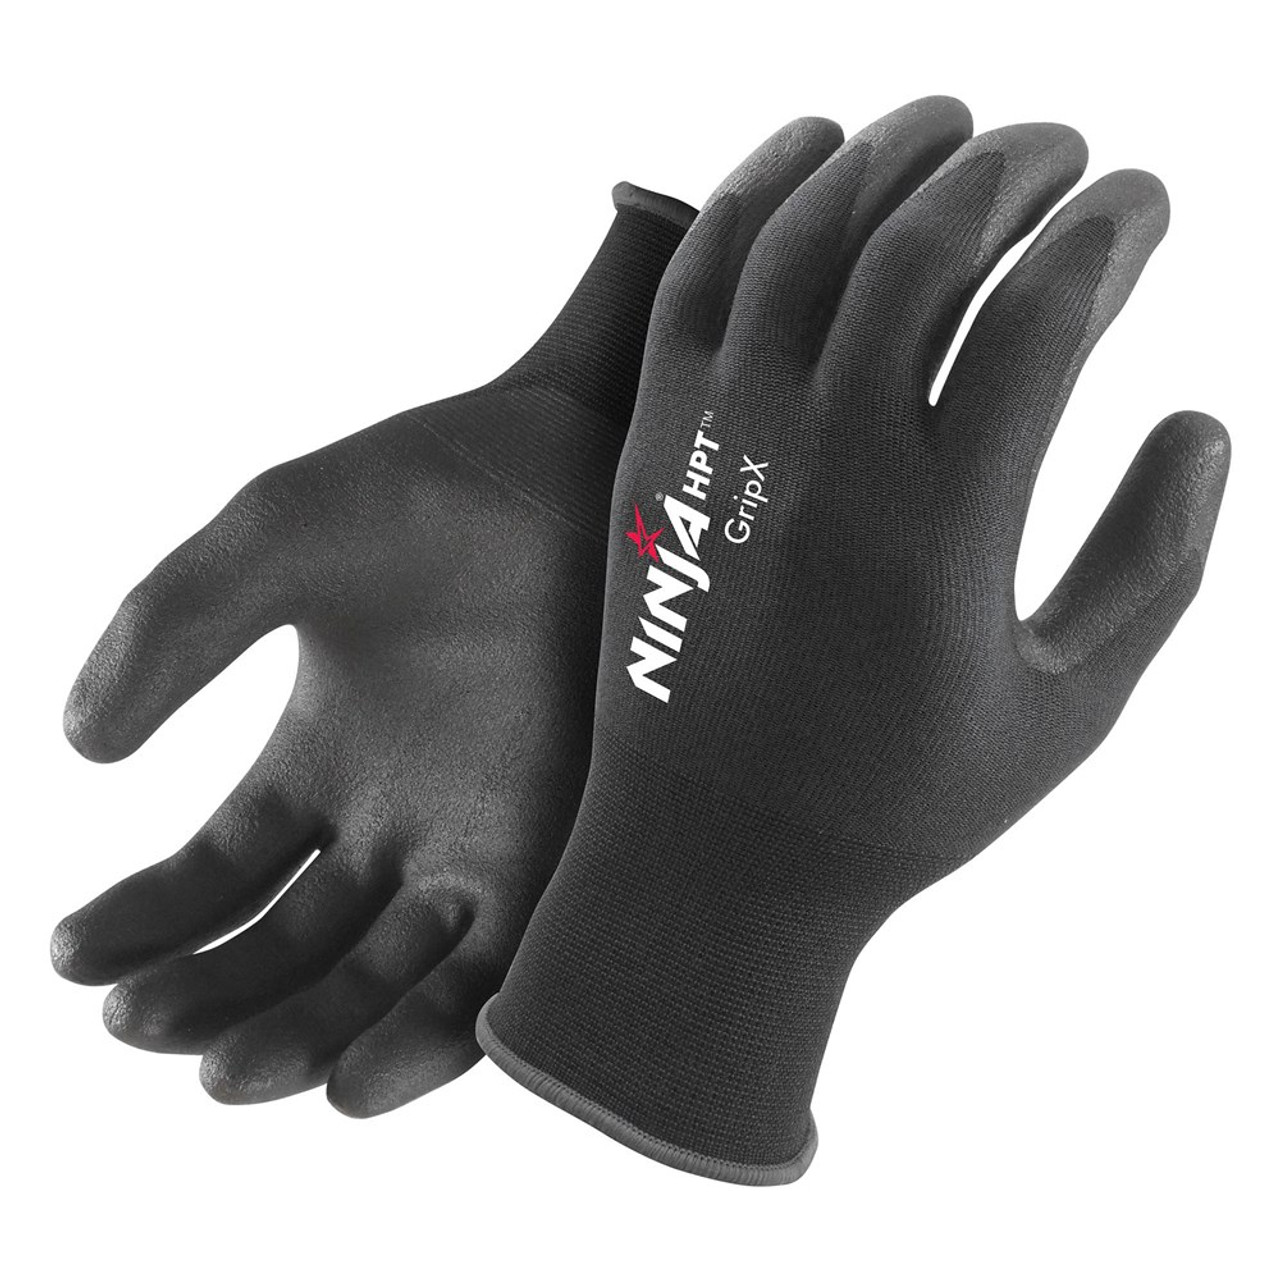 Gloves - Ninja Grip - Large